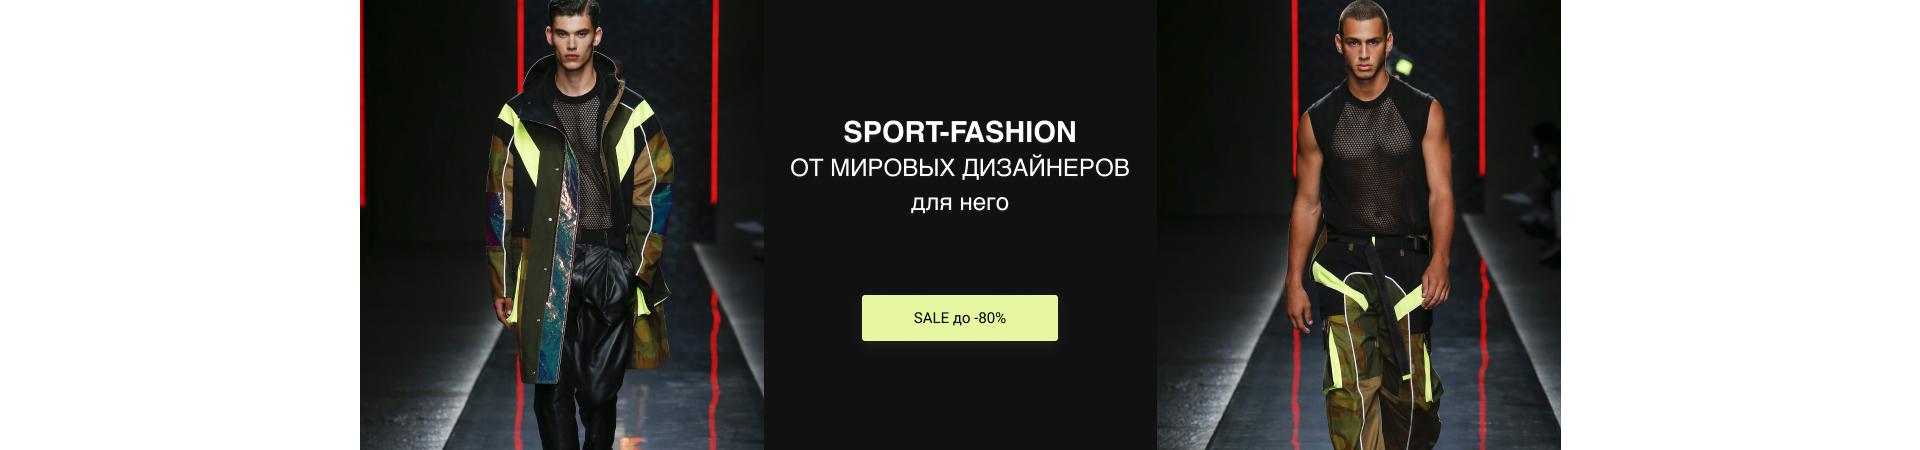 Sport fashion m